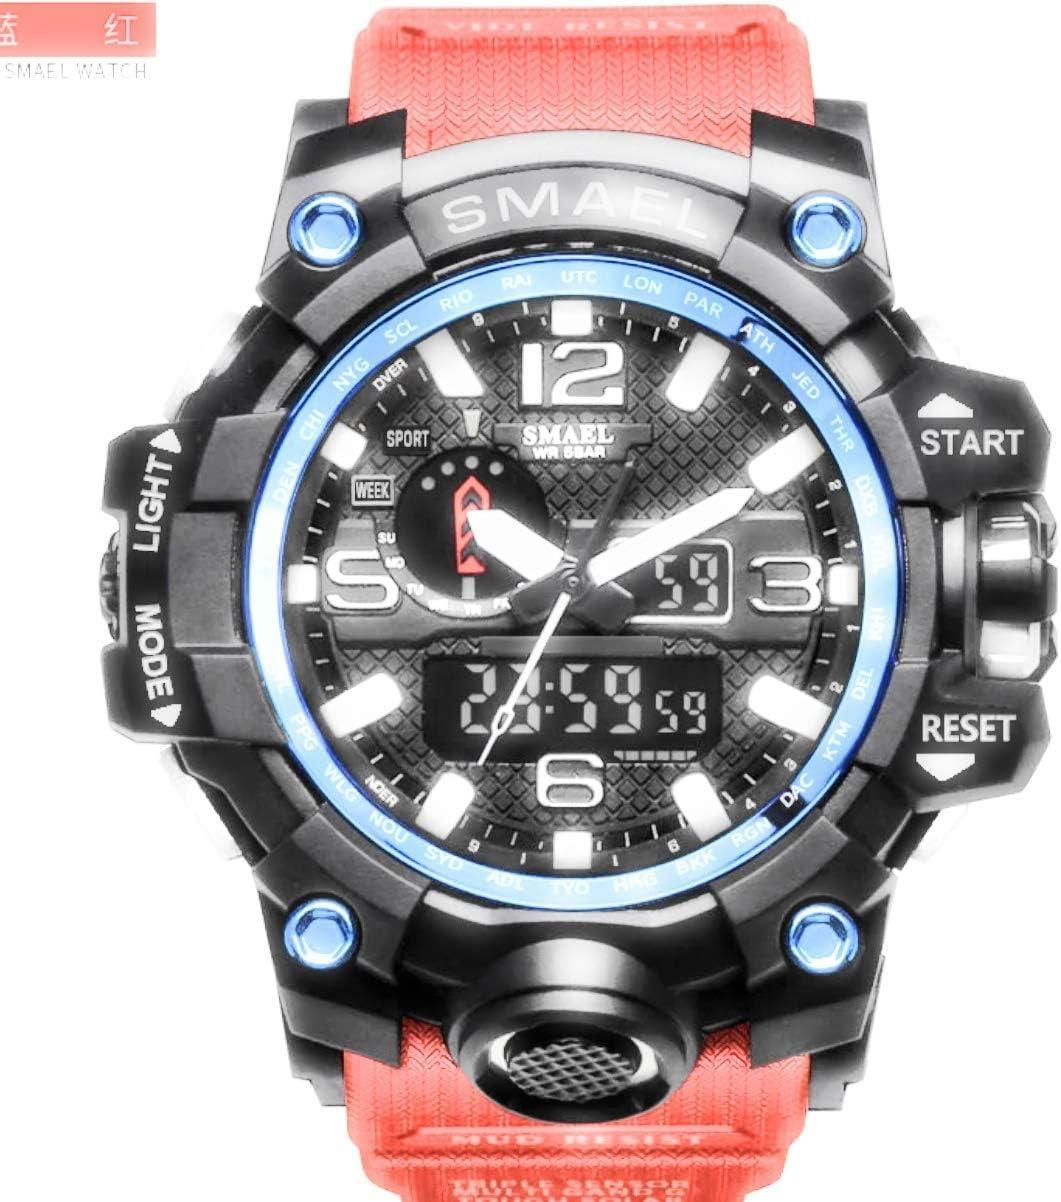 Amazon Com Psalmtrading Smael Multi Function Men S Women S Sports Analog Quartz Dual Display Waterproof Watches Led Backlight 1708 Black Blue Health Personal Care